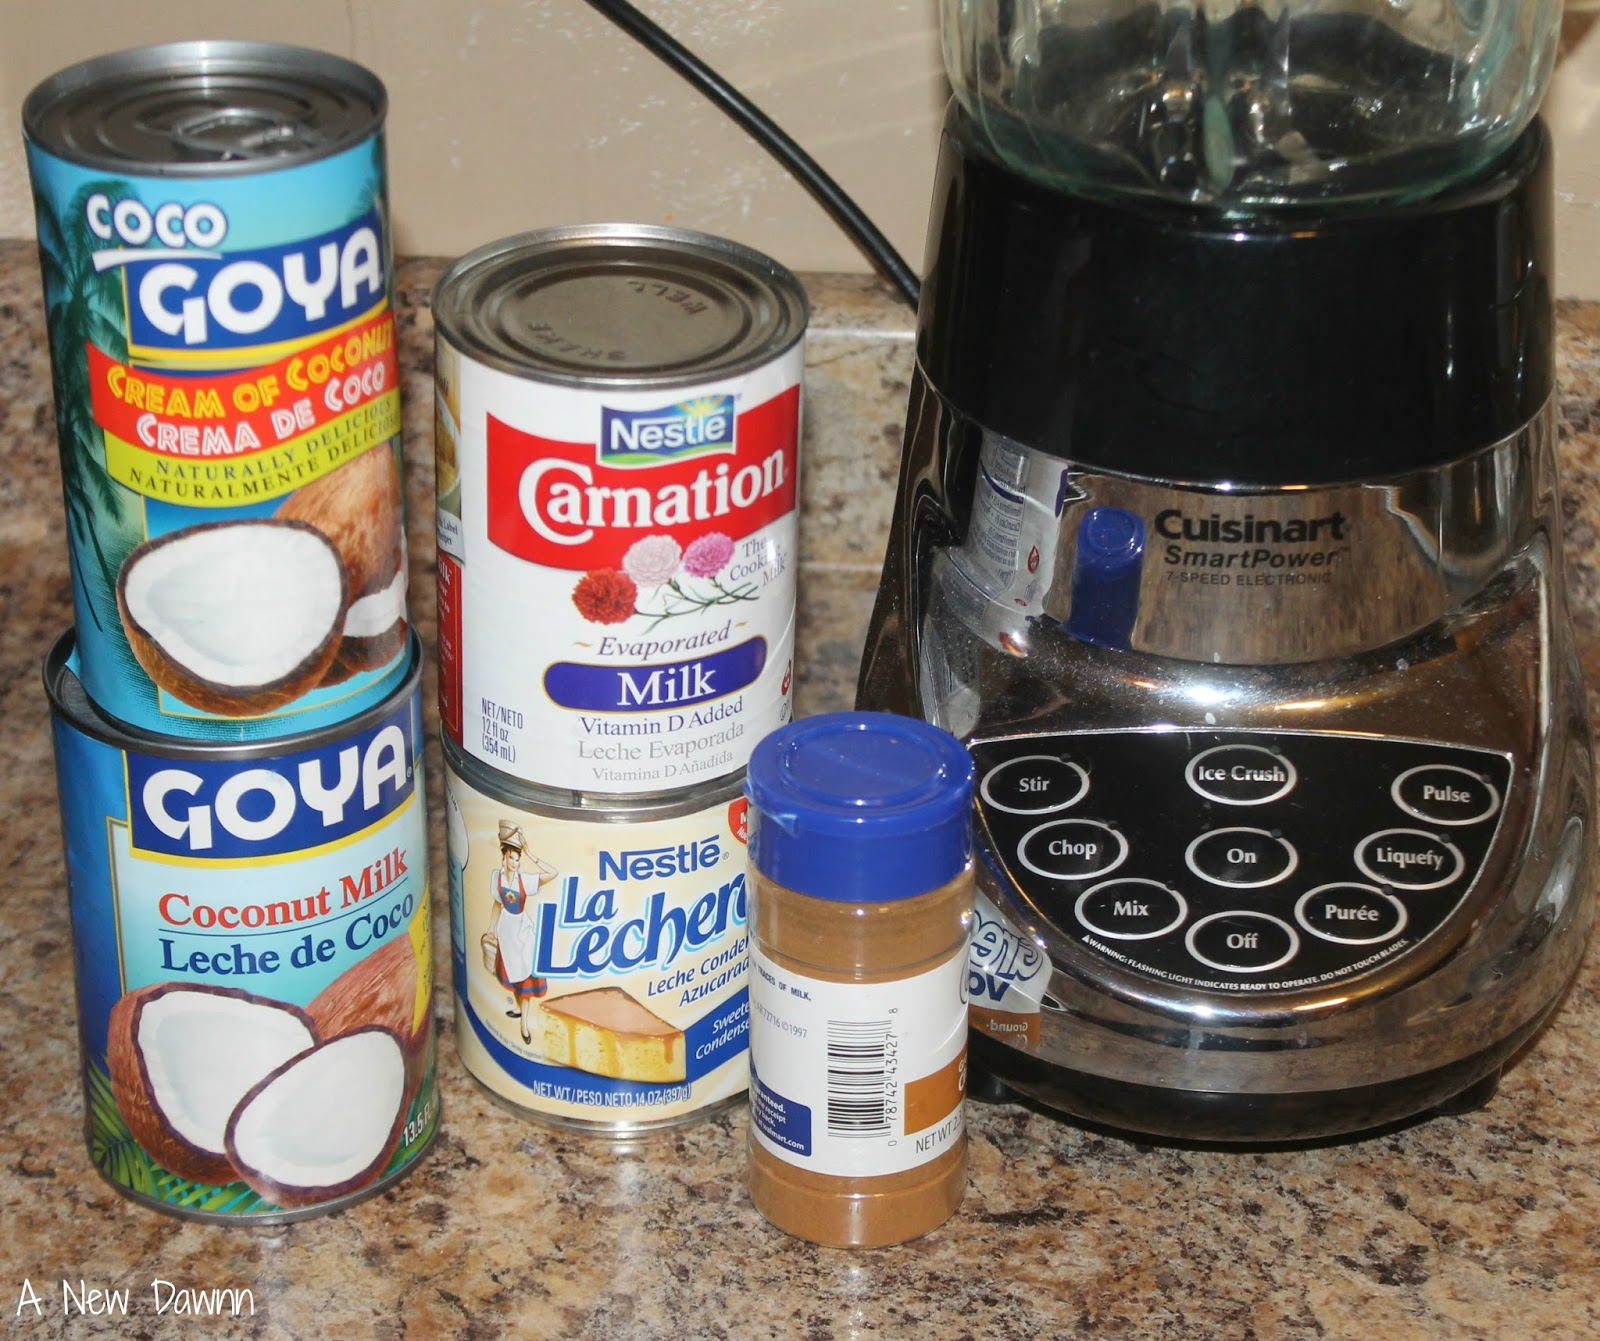 Coquito Recipe - How to make this Puerto Rican Coconut Eggnog